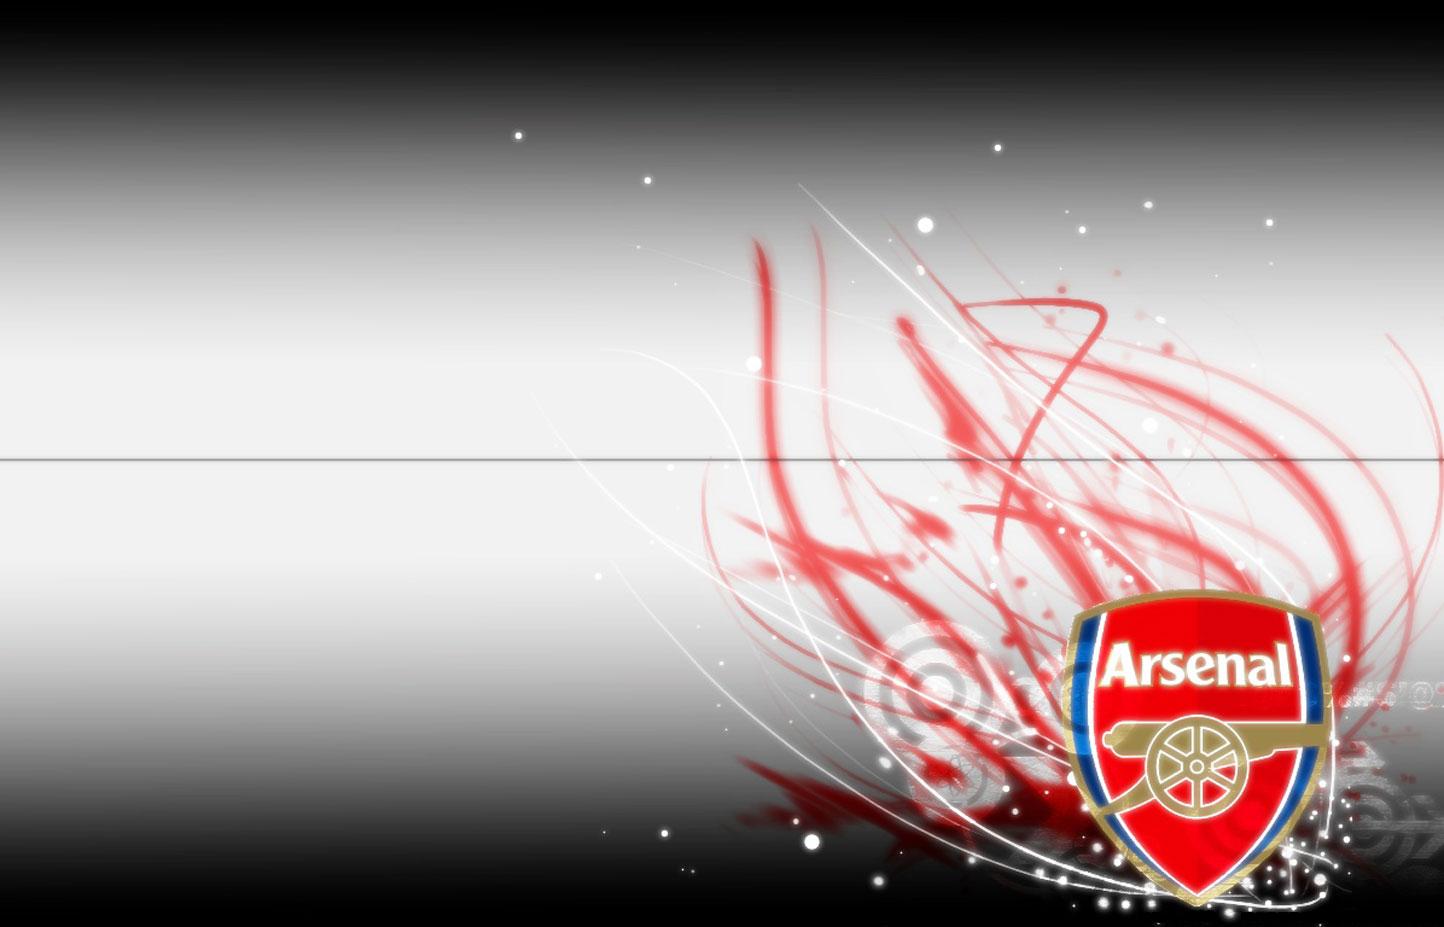 Arsenal FC Logo 2013 1444x927